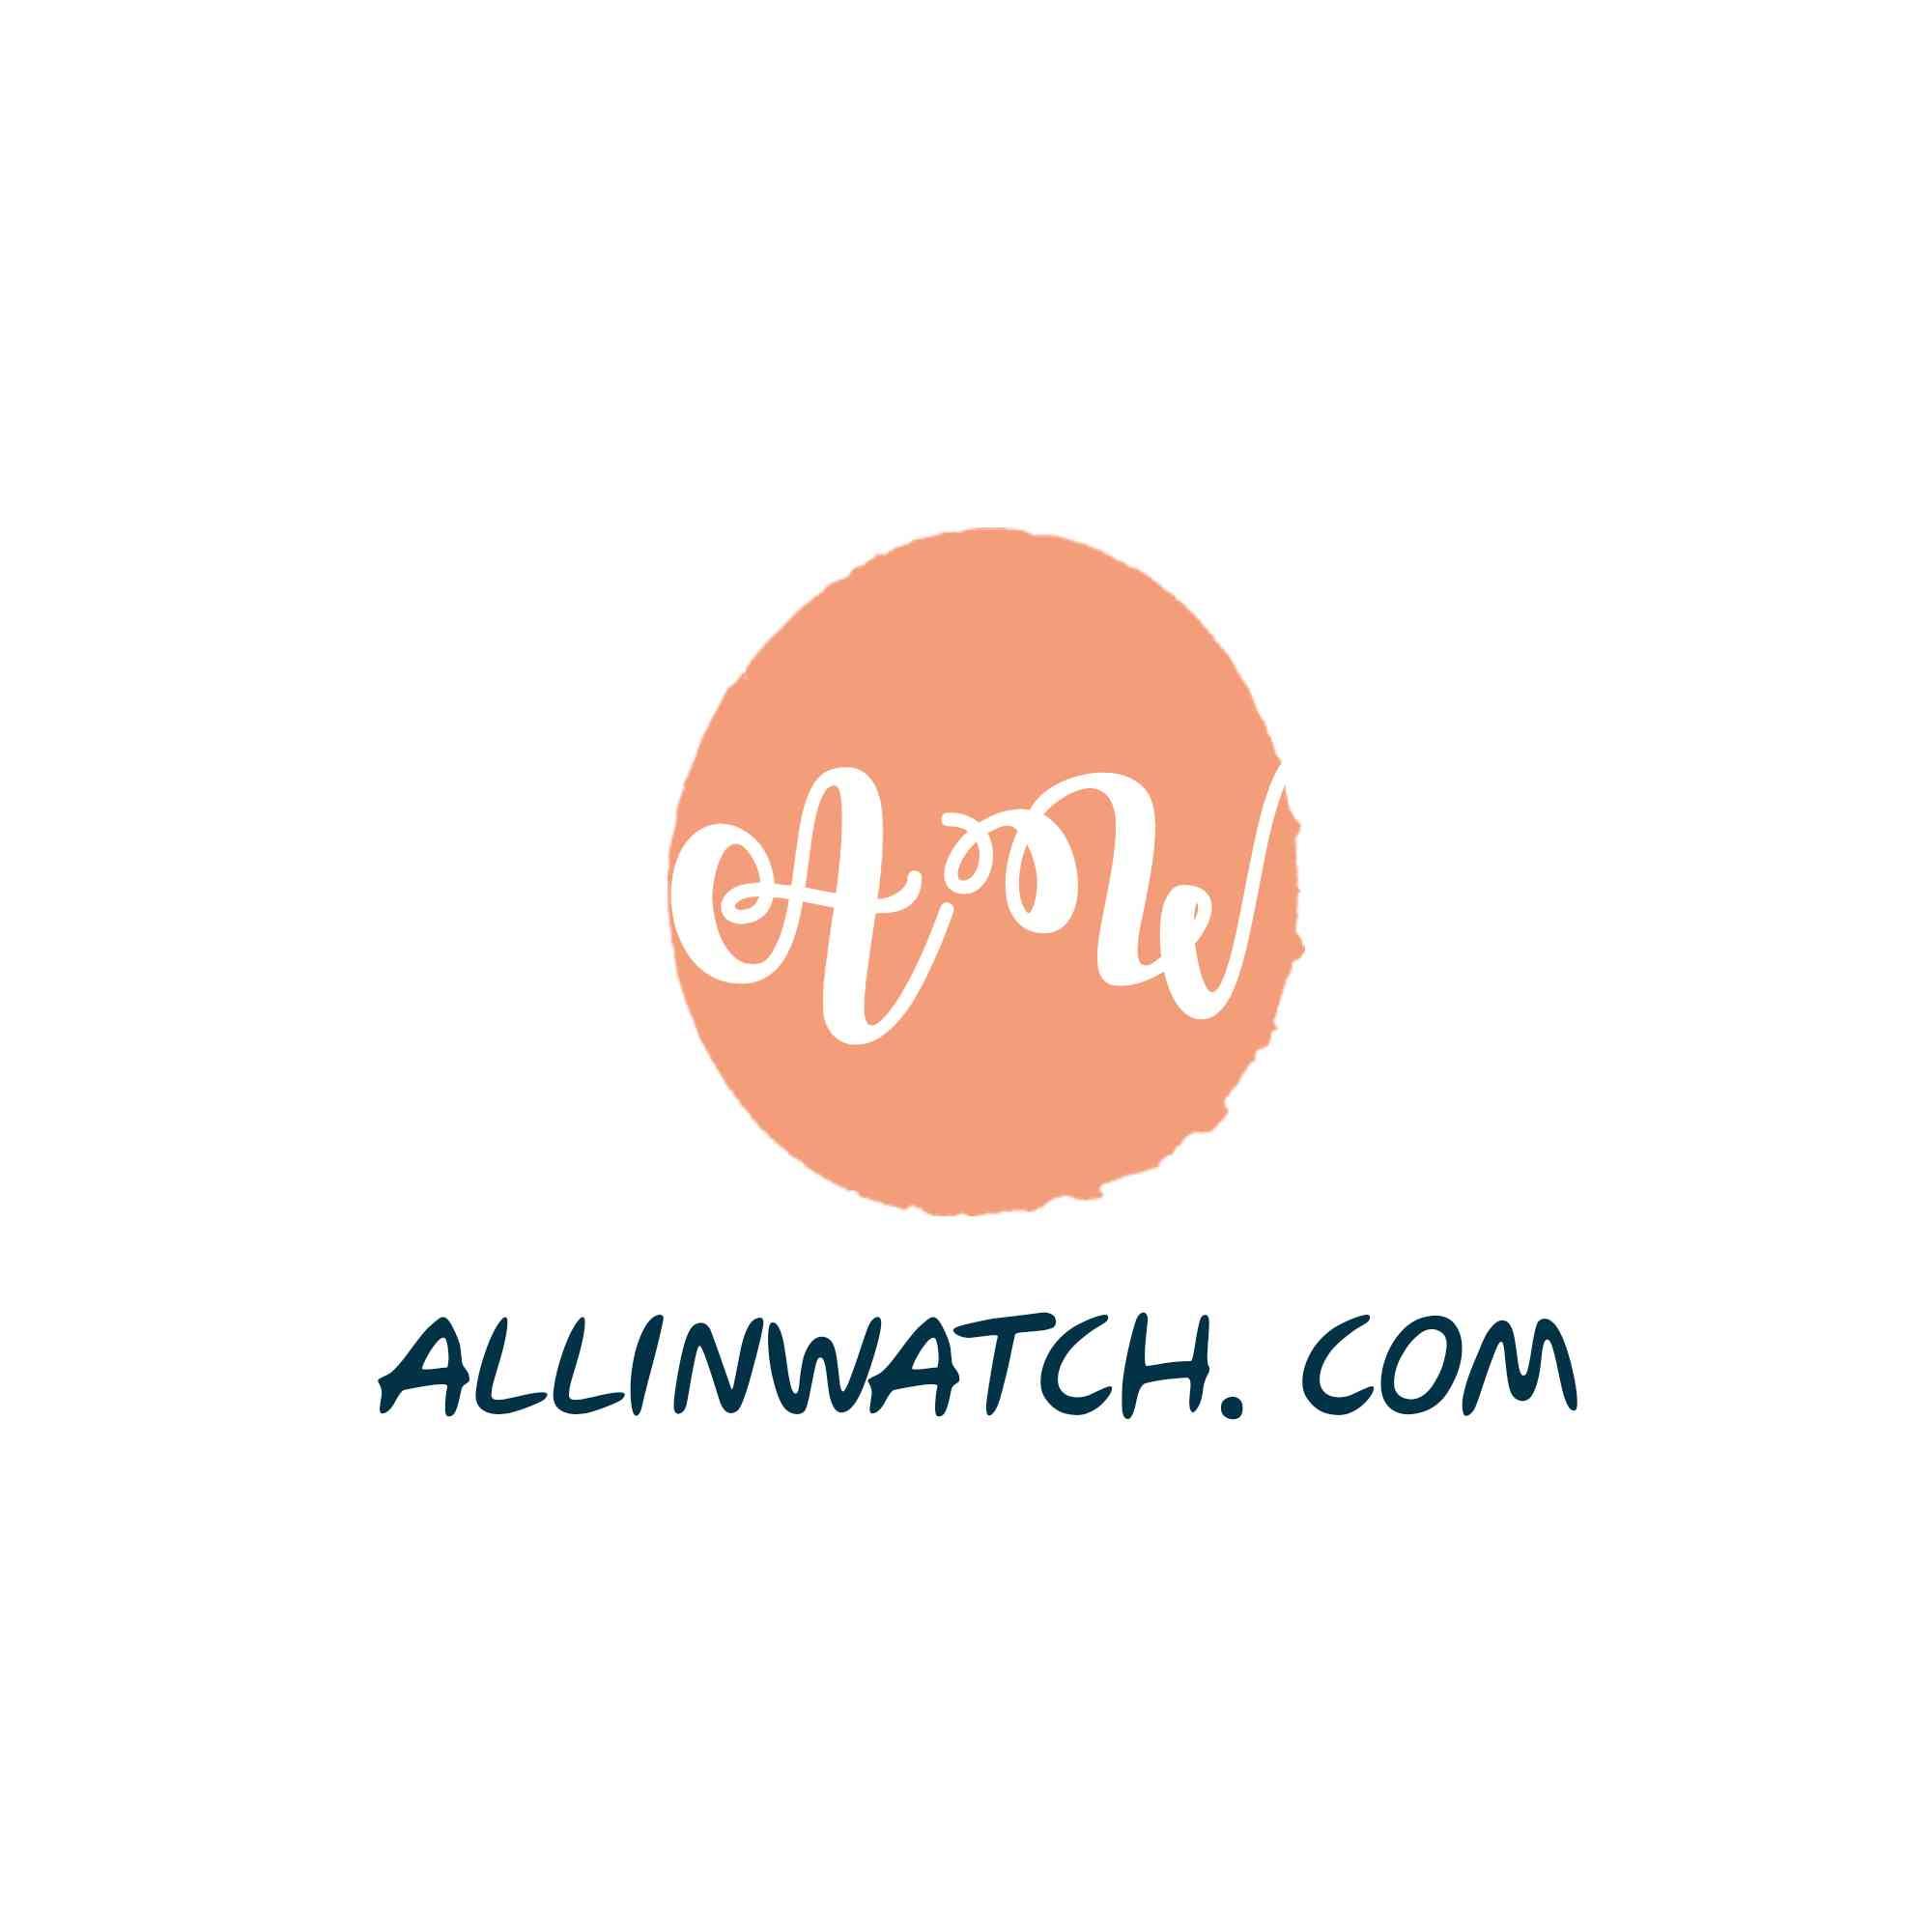 Allinwatch.com